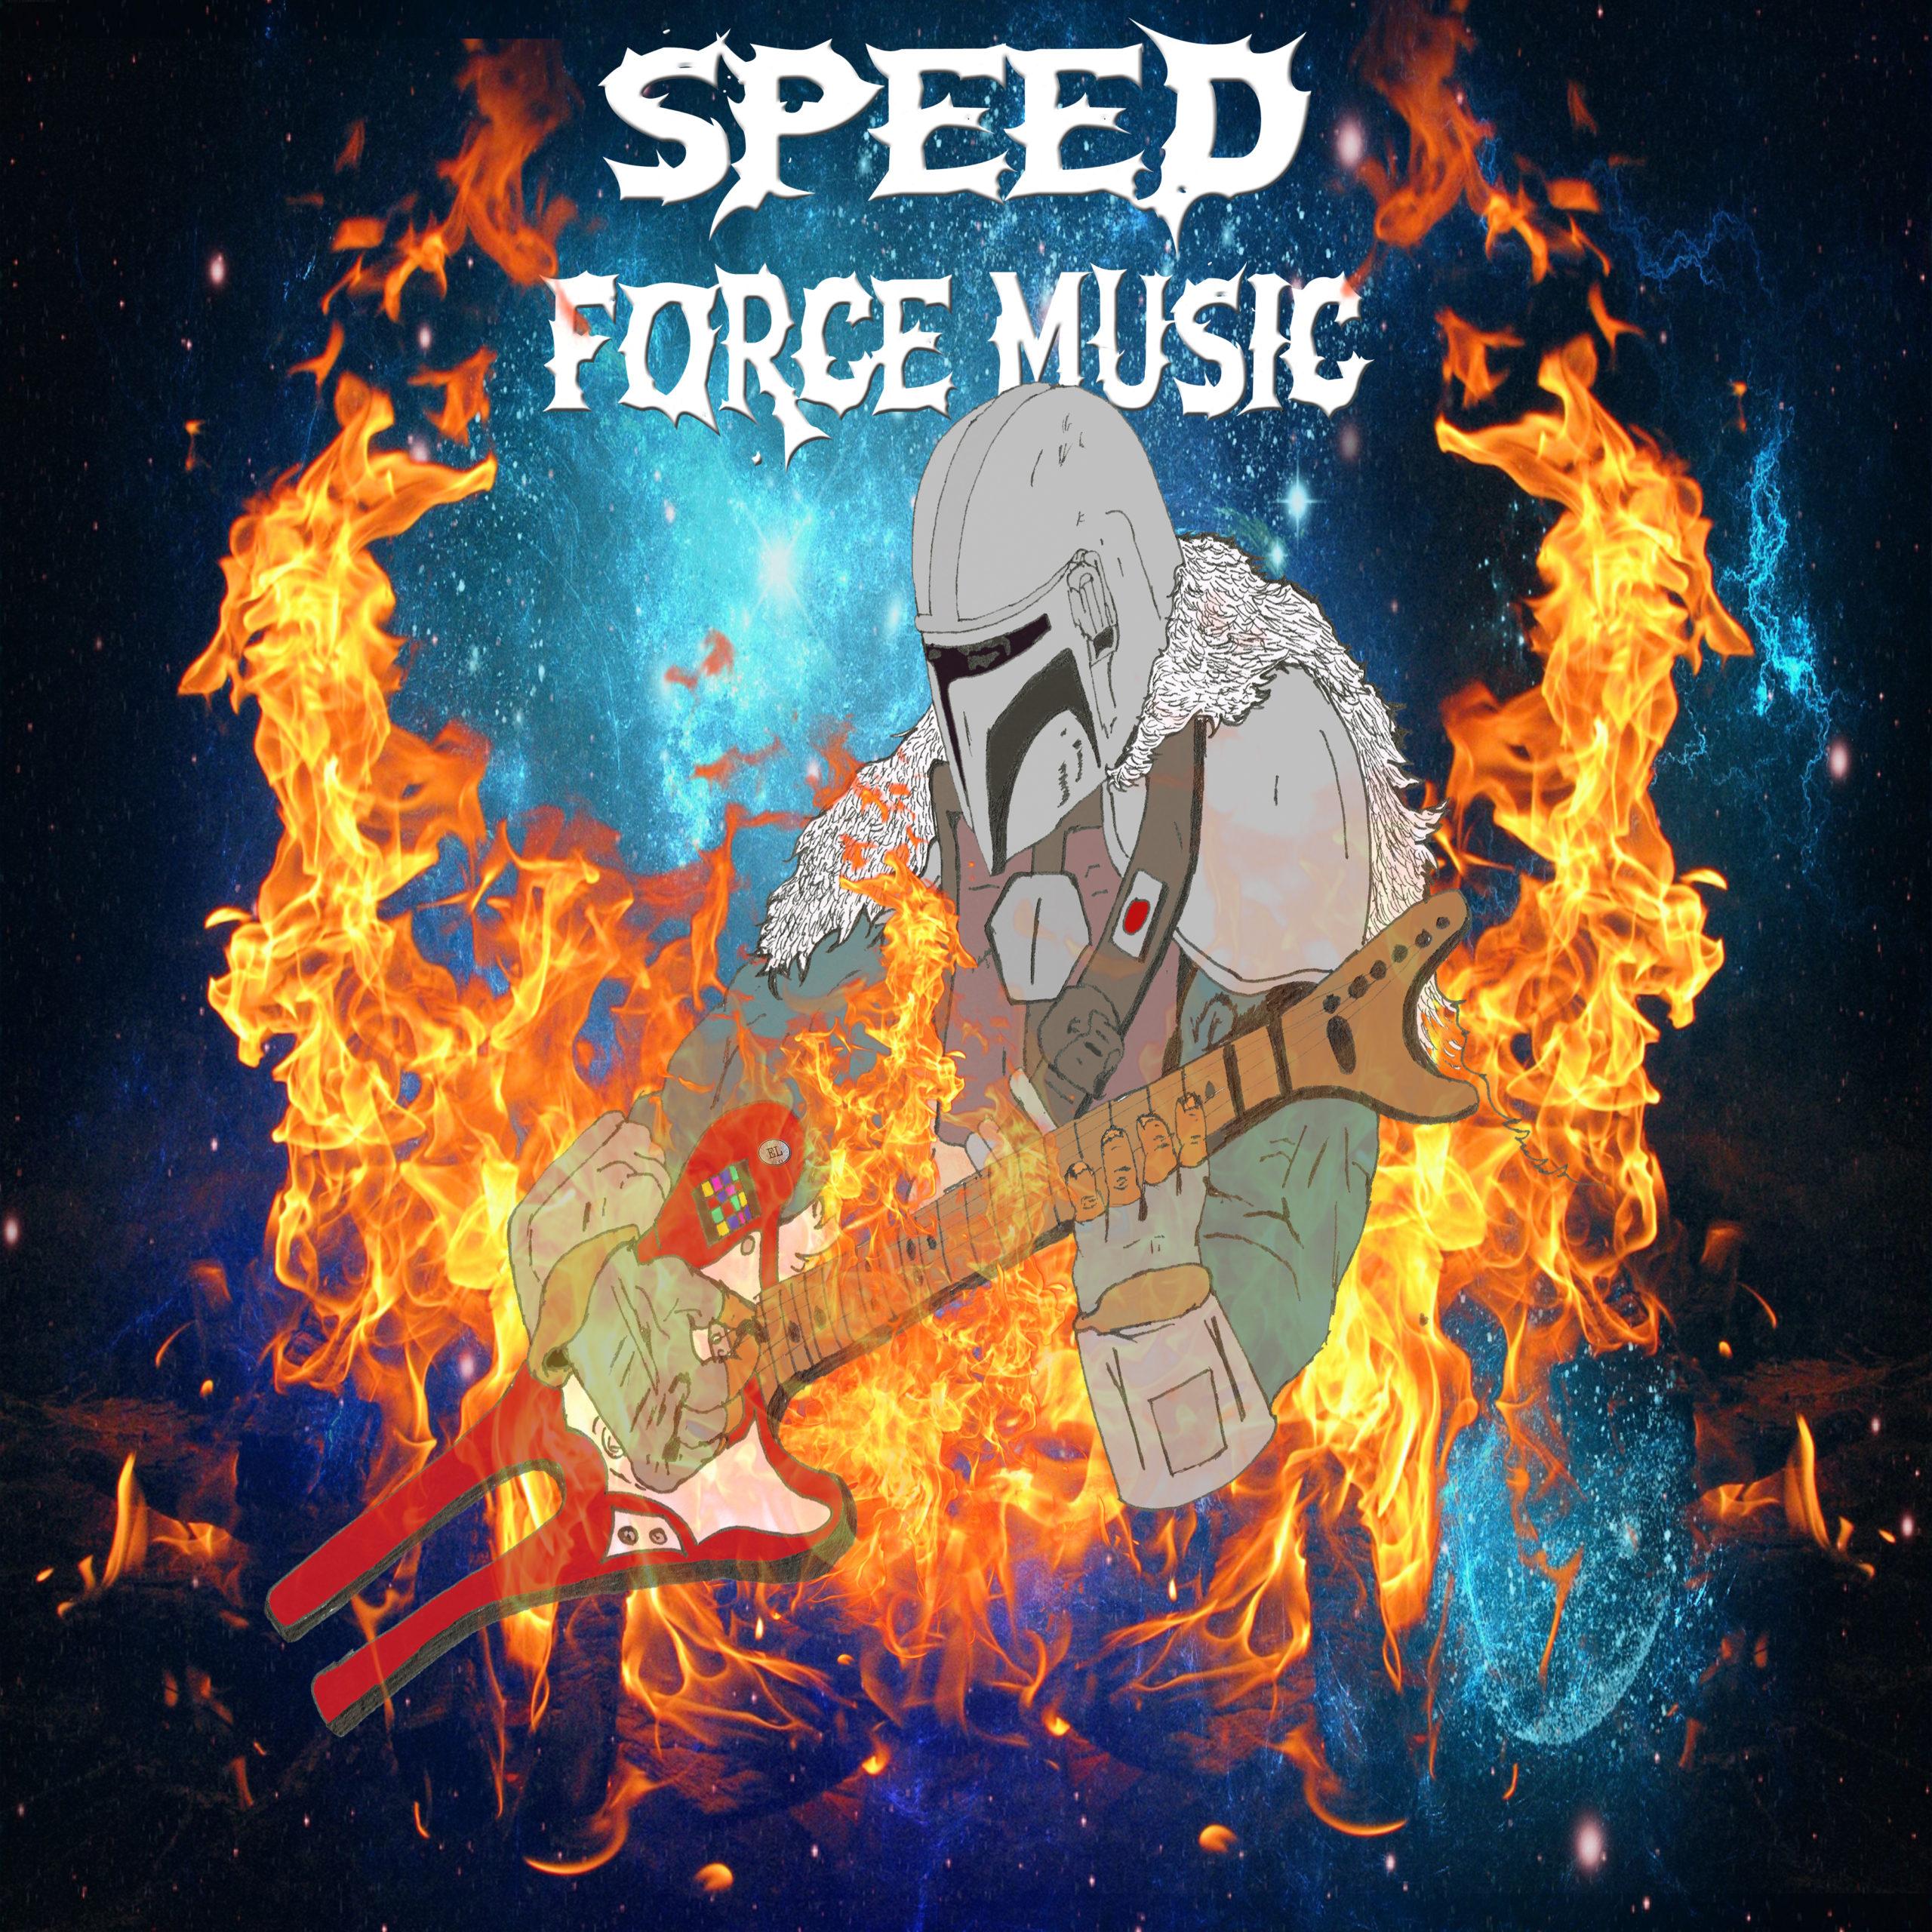 Speed Force Music Original Mandalorian Art Final Product